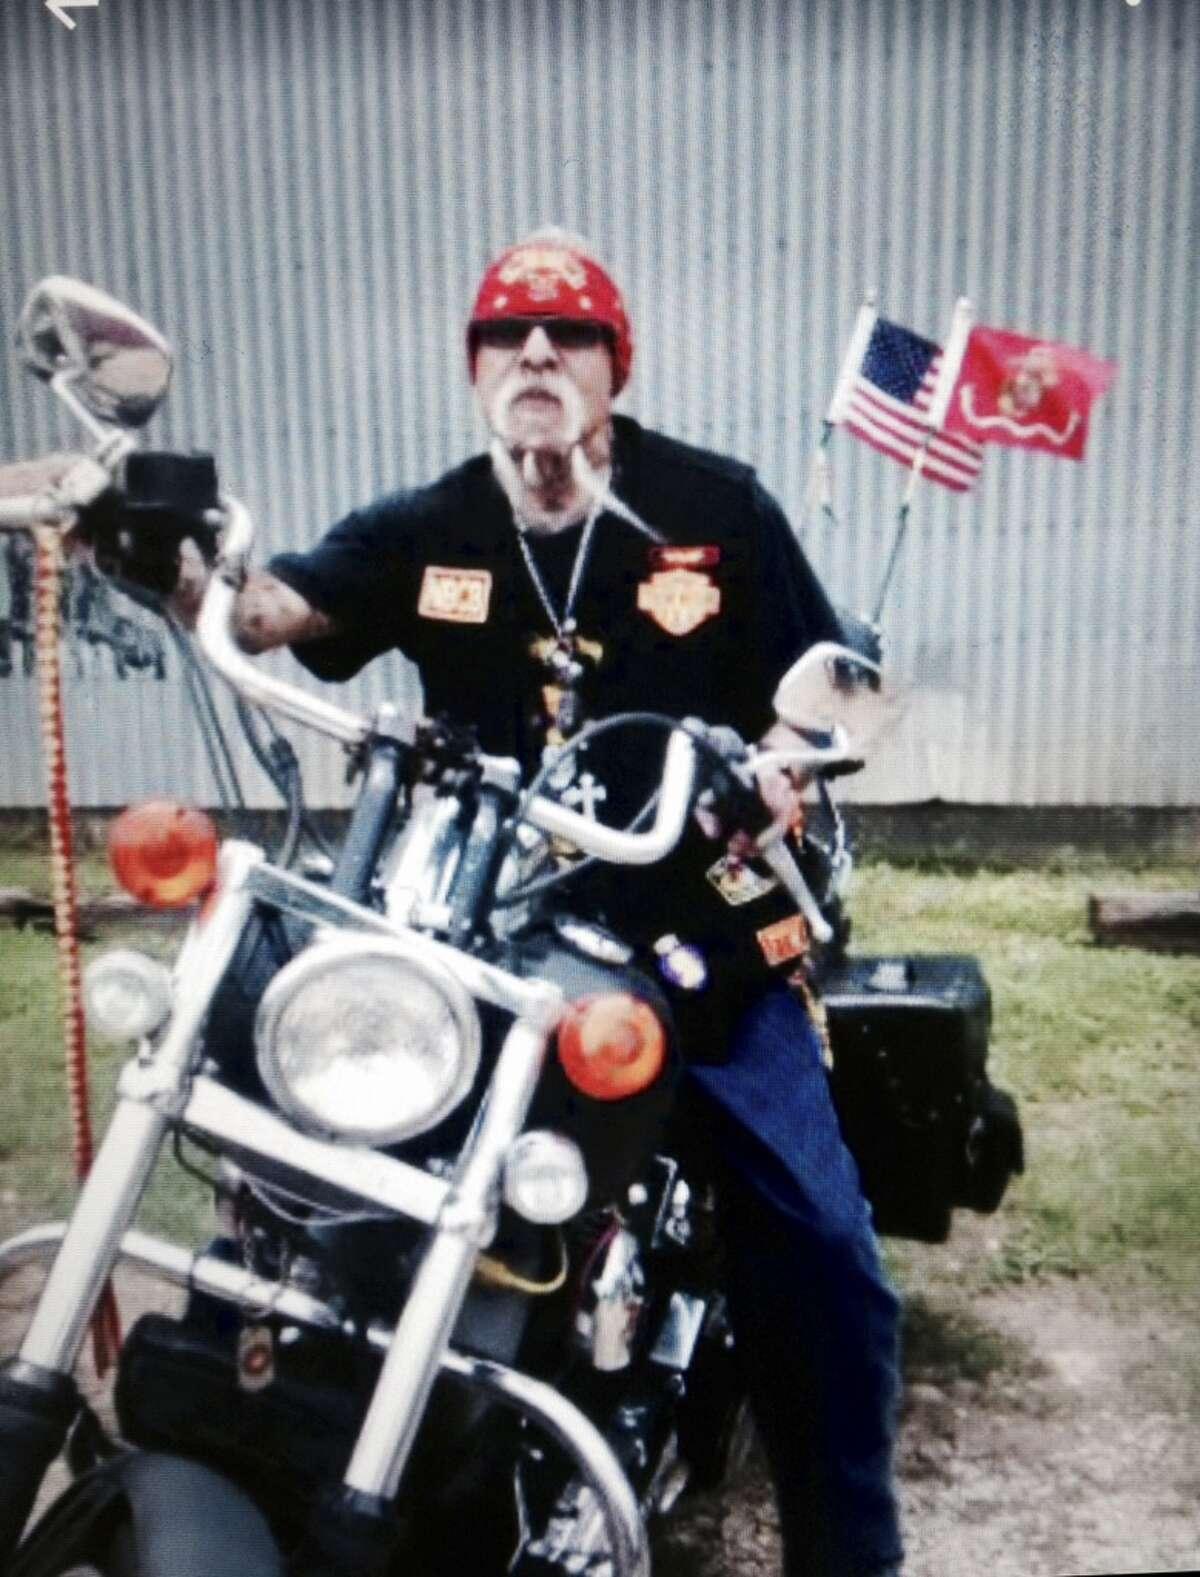 Jesus Delgado Rodriguez was among nine biker killed in Waco on May 17. Jesus Delgado Rodriguez's family say he was not a violent man.